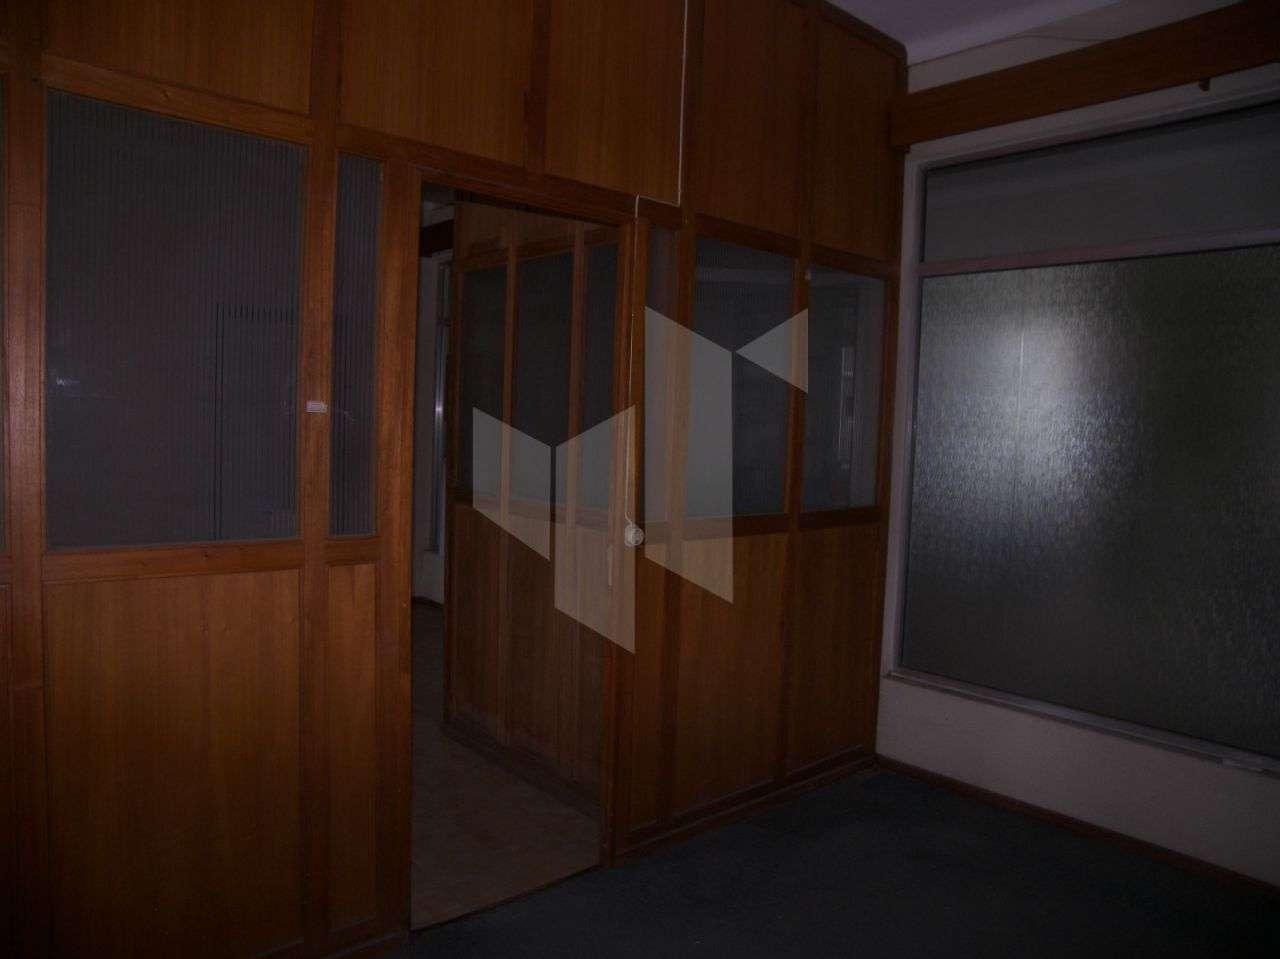 Escritório para arrendar, Tondela e Nandufe, Tondela, Viseu - Foto 8